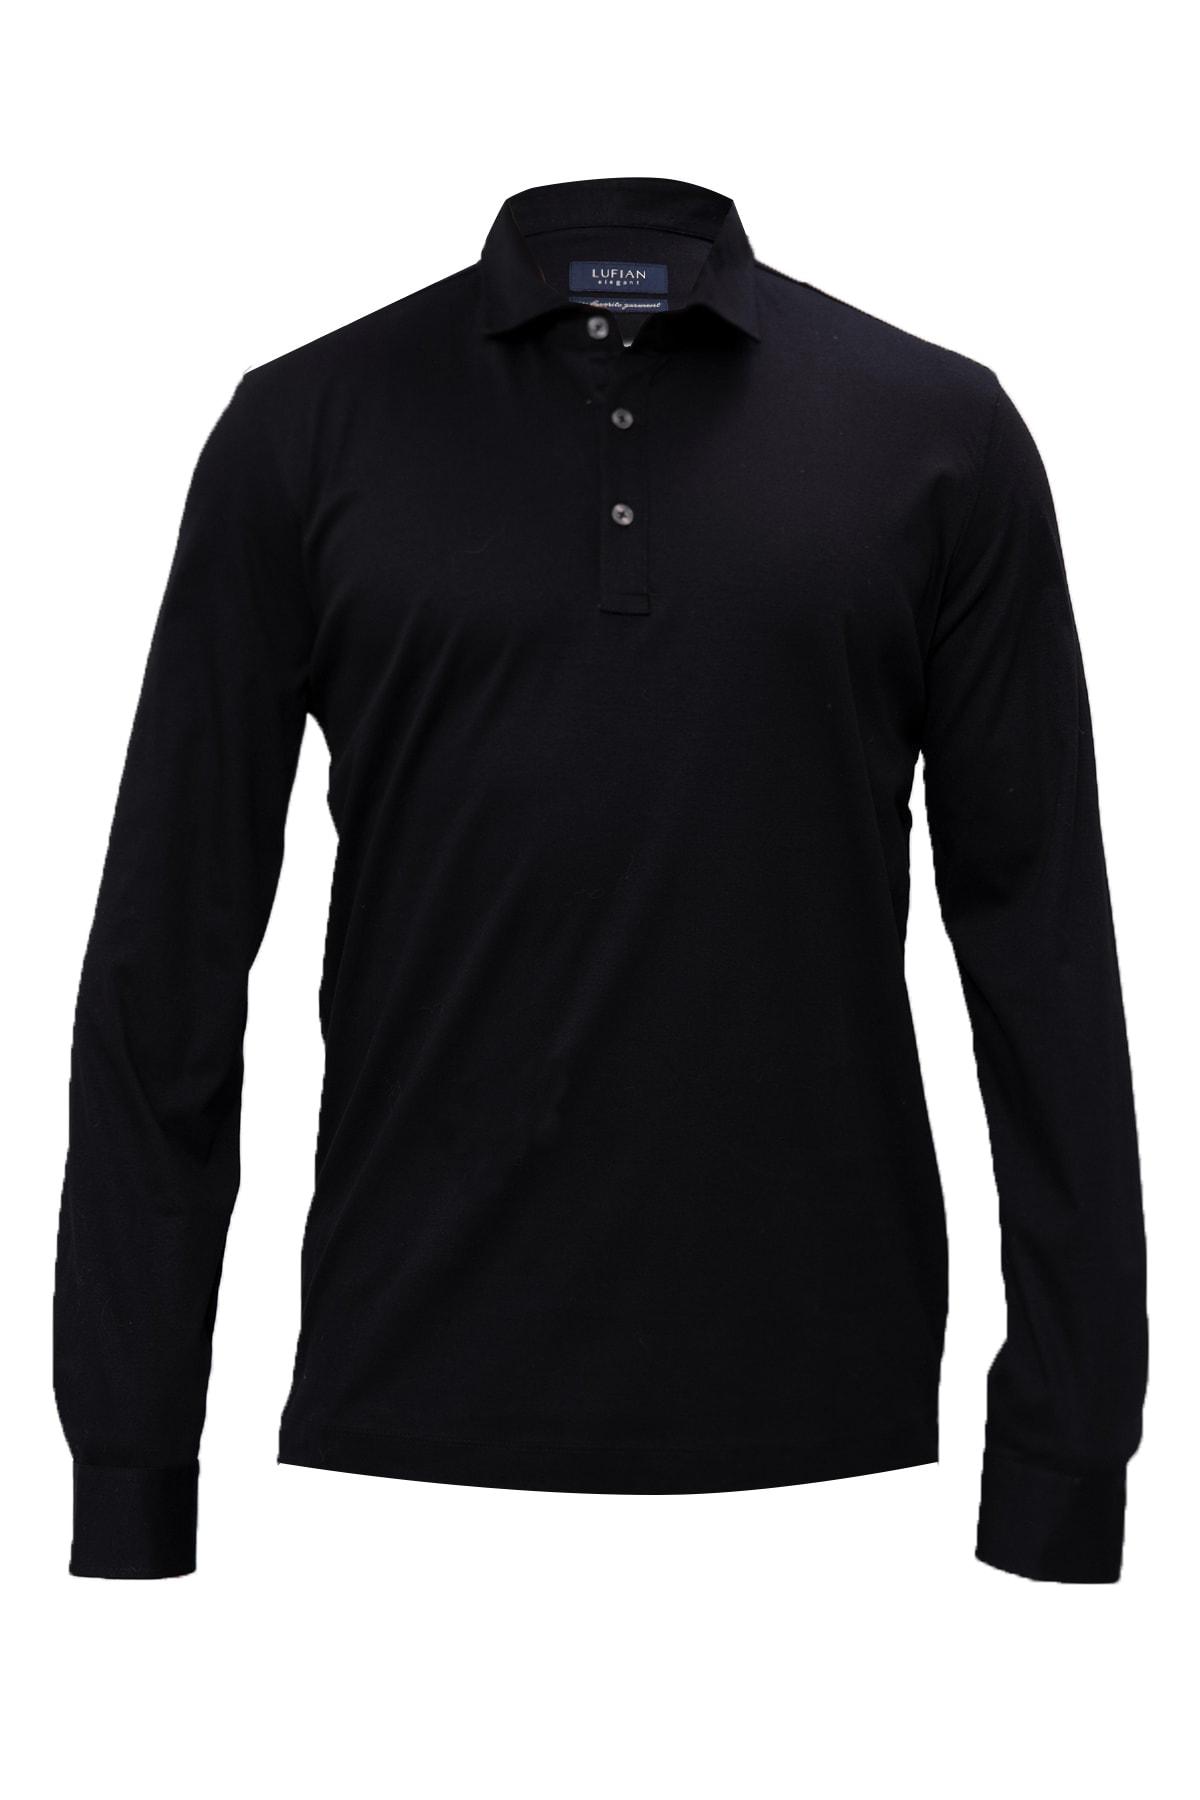 Lufian Erkek Lacivert Asil Spor Polo T- Shirt 111040064100200